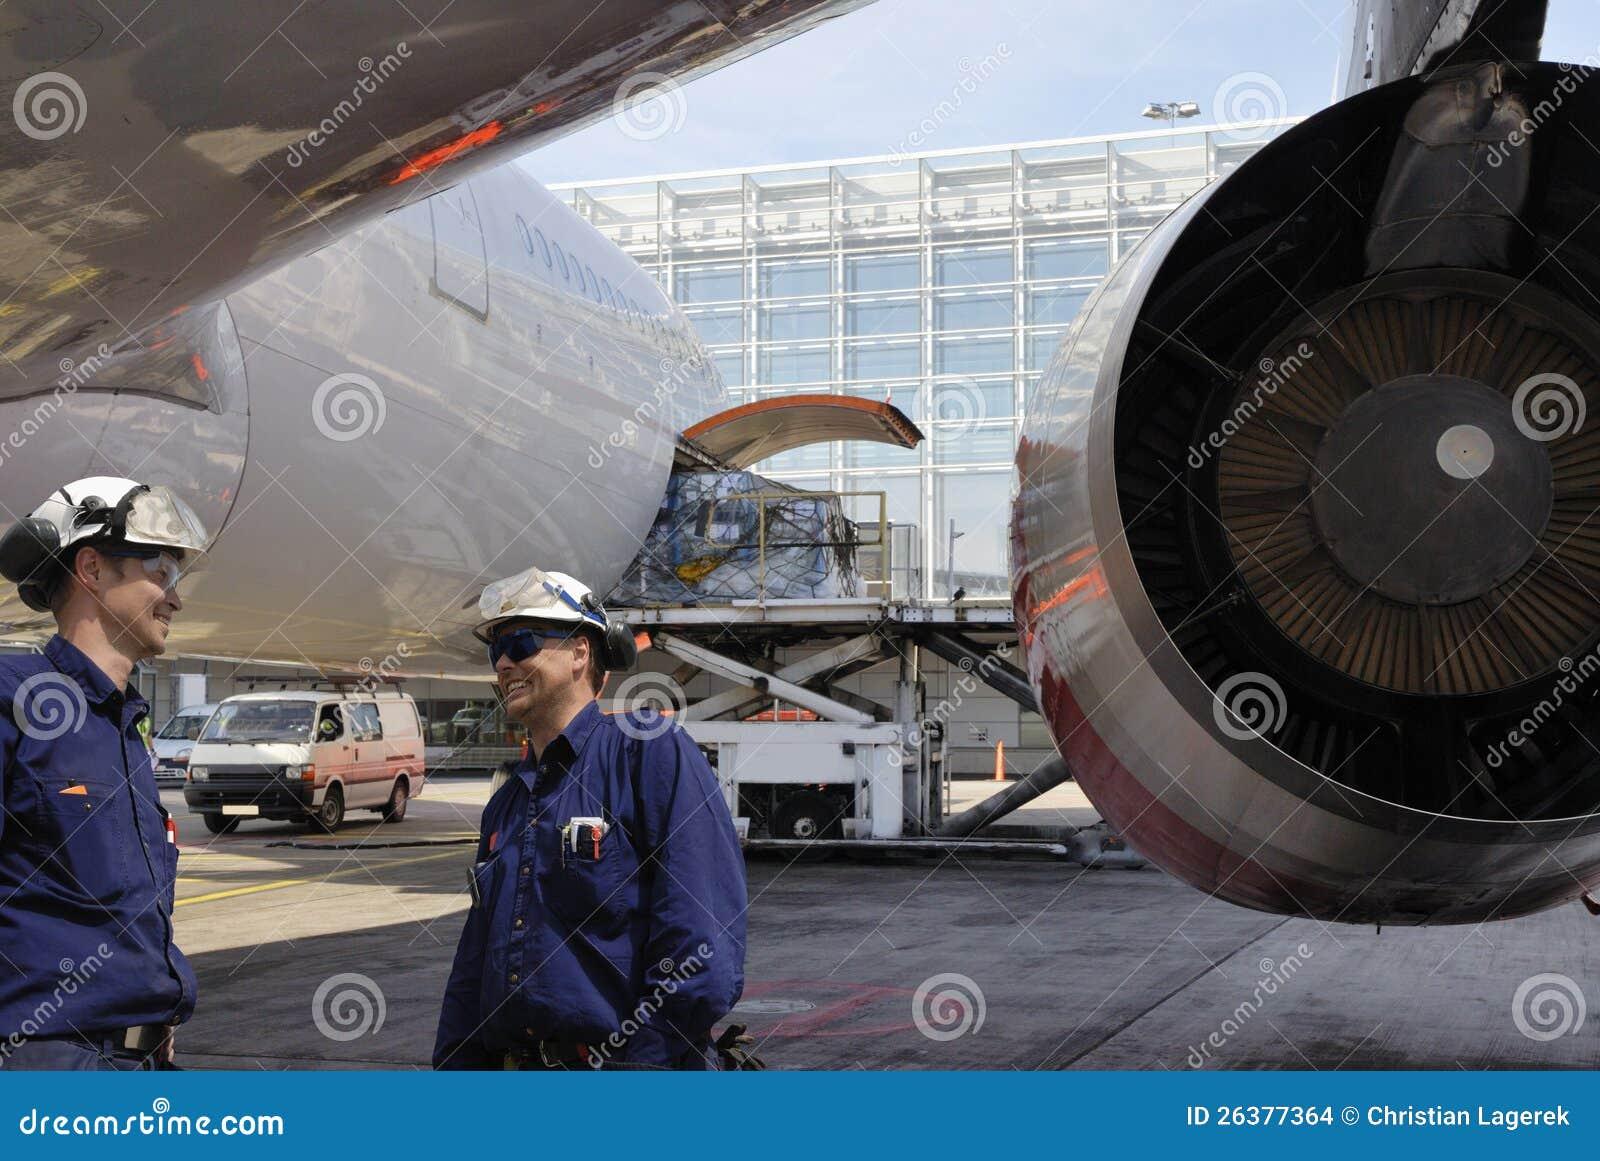 airplane mechanics and jet engine stock images image